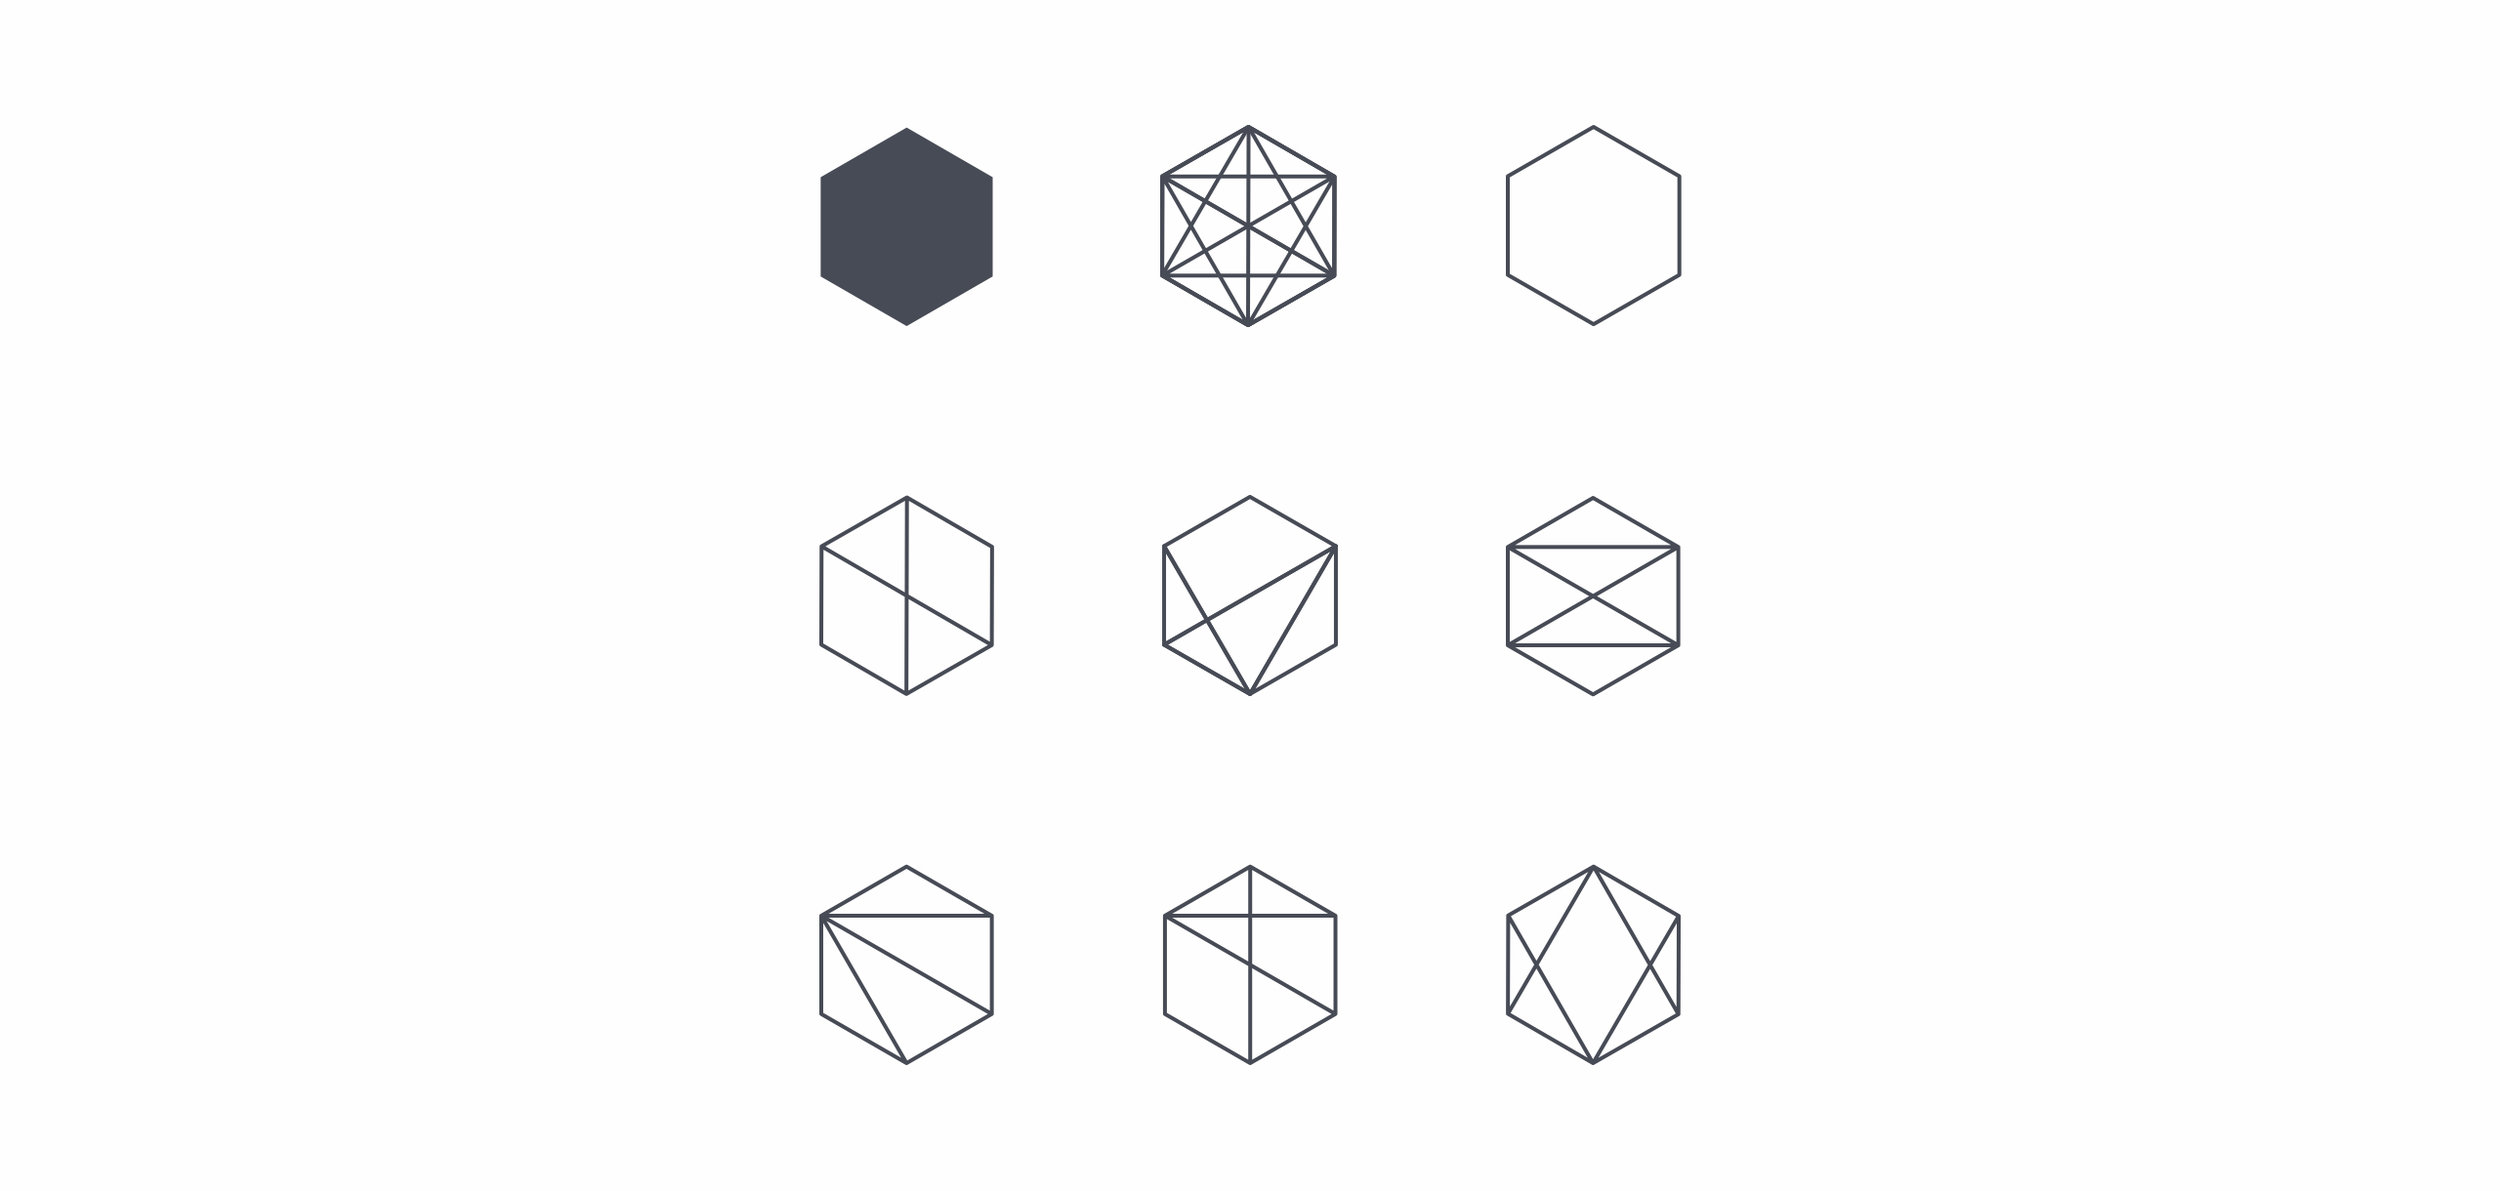 emds_brand-patterns-01@2x.jpg